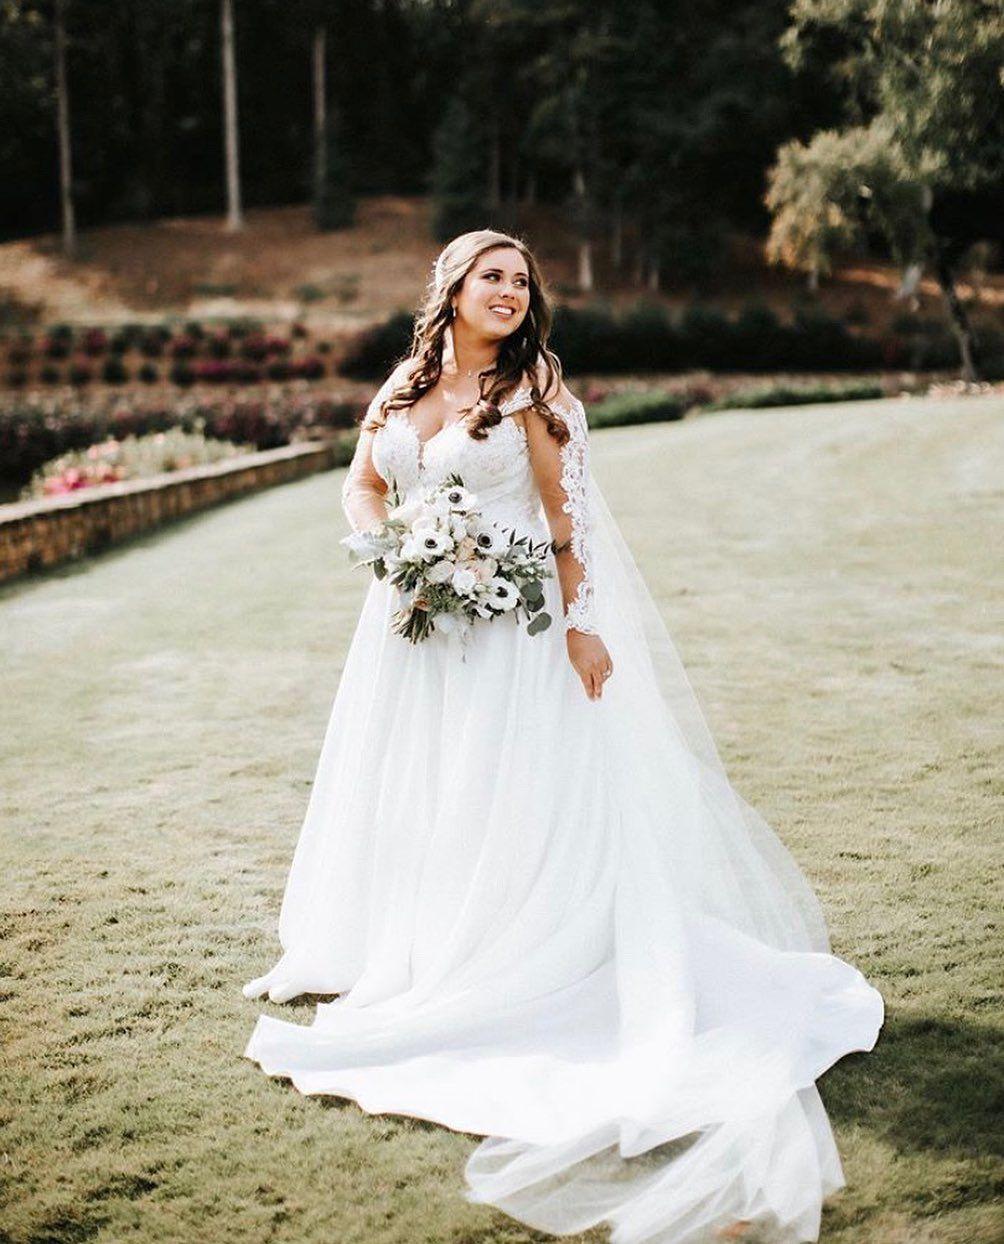 Gorgeous Romantic Long Sleeved Wedding Dress With Embroidery In 2020 Wedding Dress Long Sleeve Wedding Dresses Sleeved Wedding